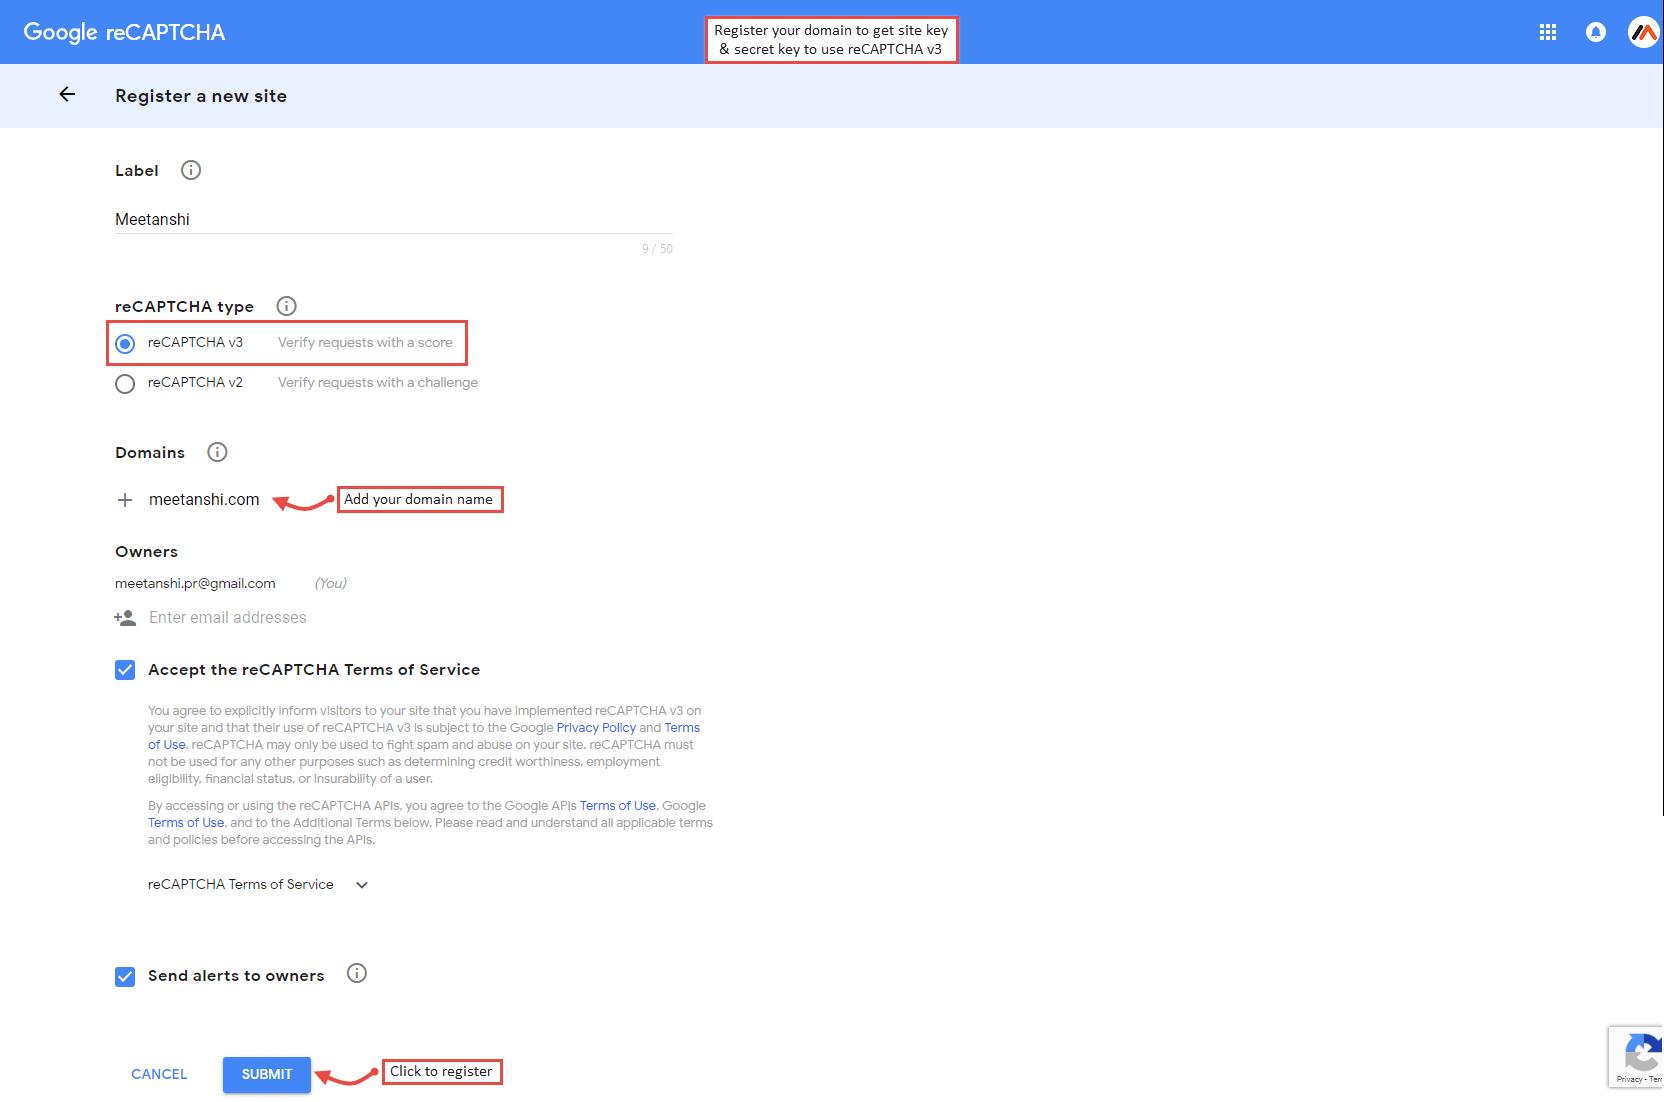 Get Google reCAPTCHA site key and secret key